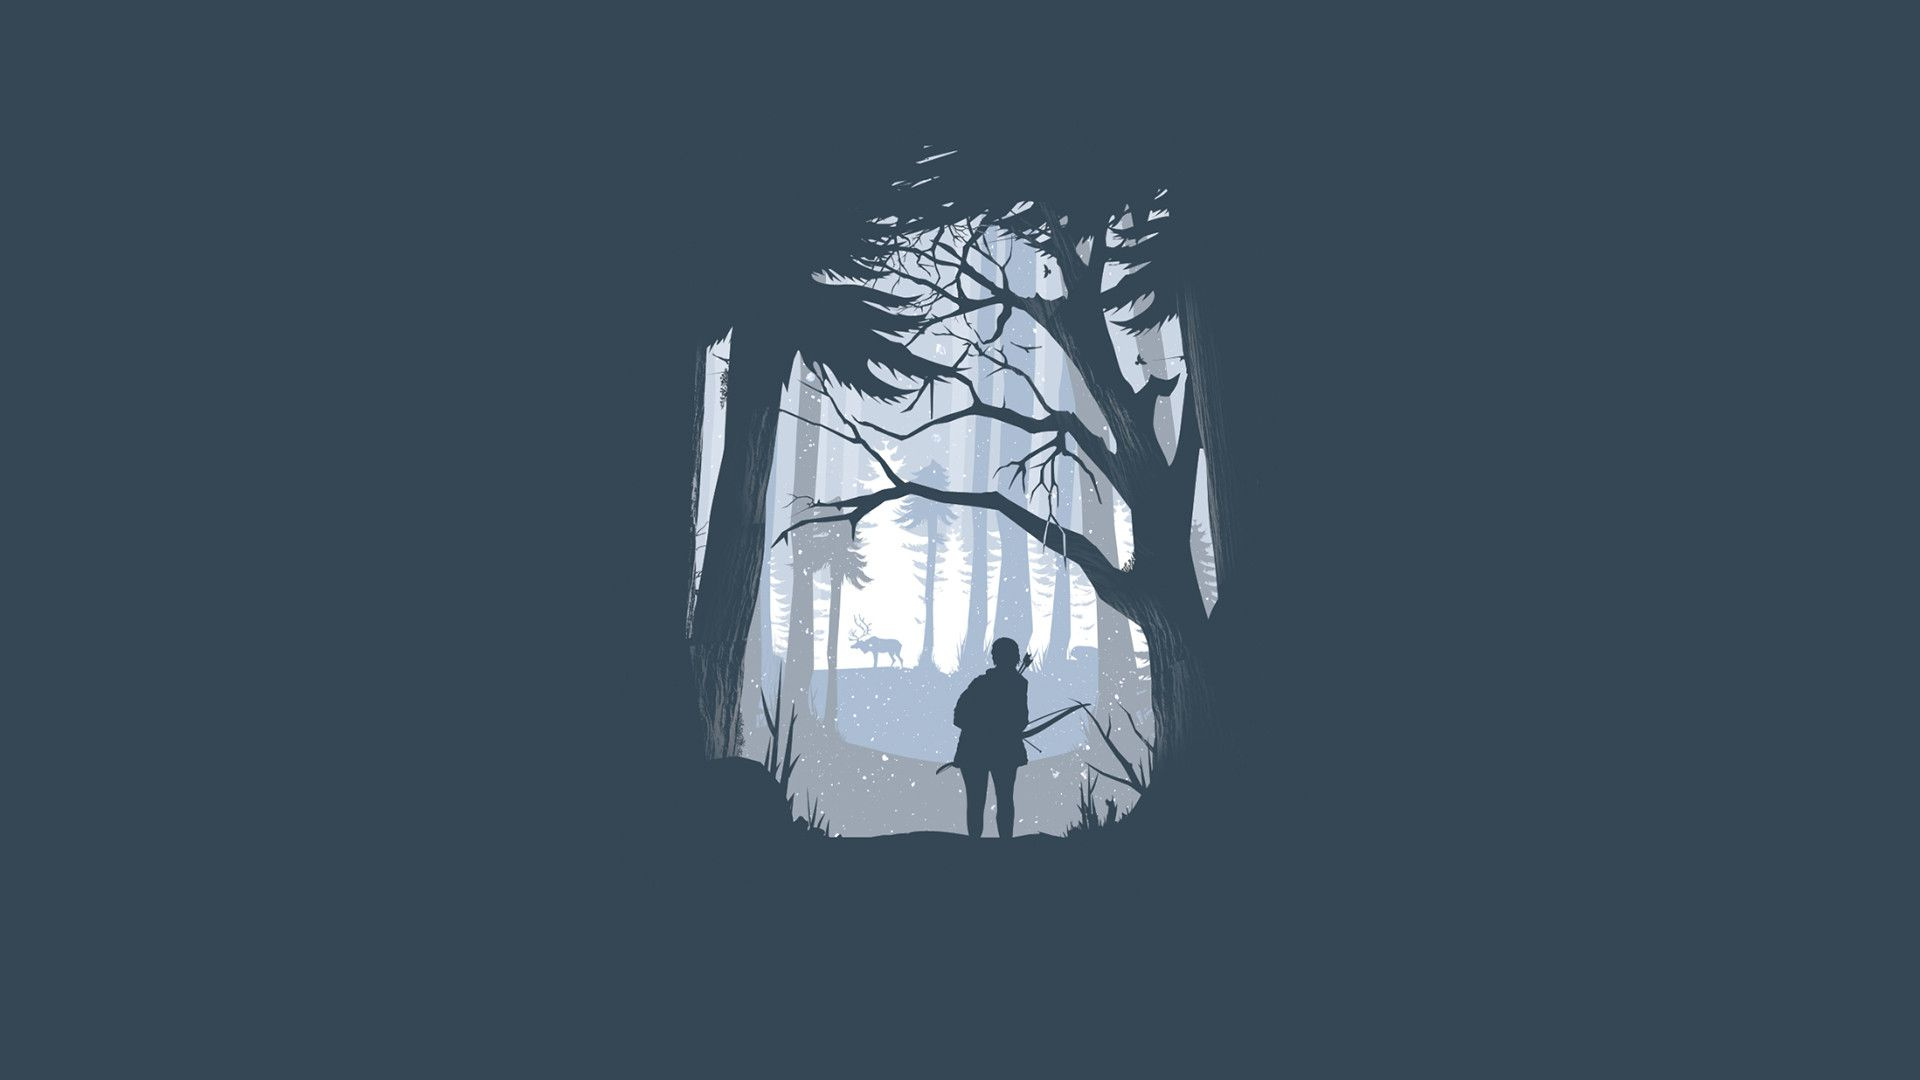 The Last Of Us Wallpapers Minimalist Wallpaper Minimalist Desktop Wallpaper Minimal Wallpaper